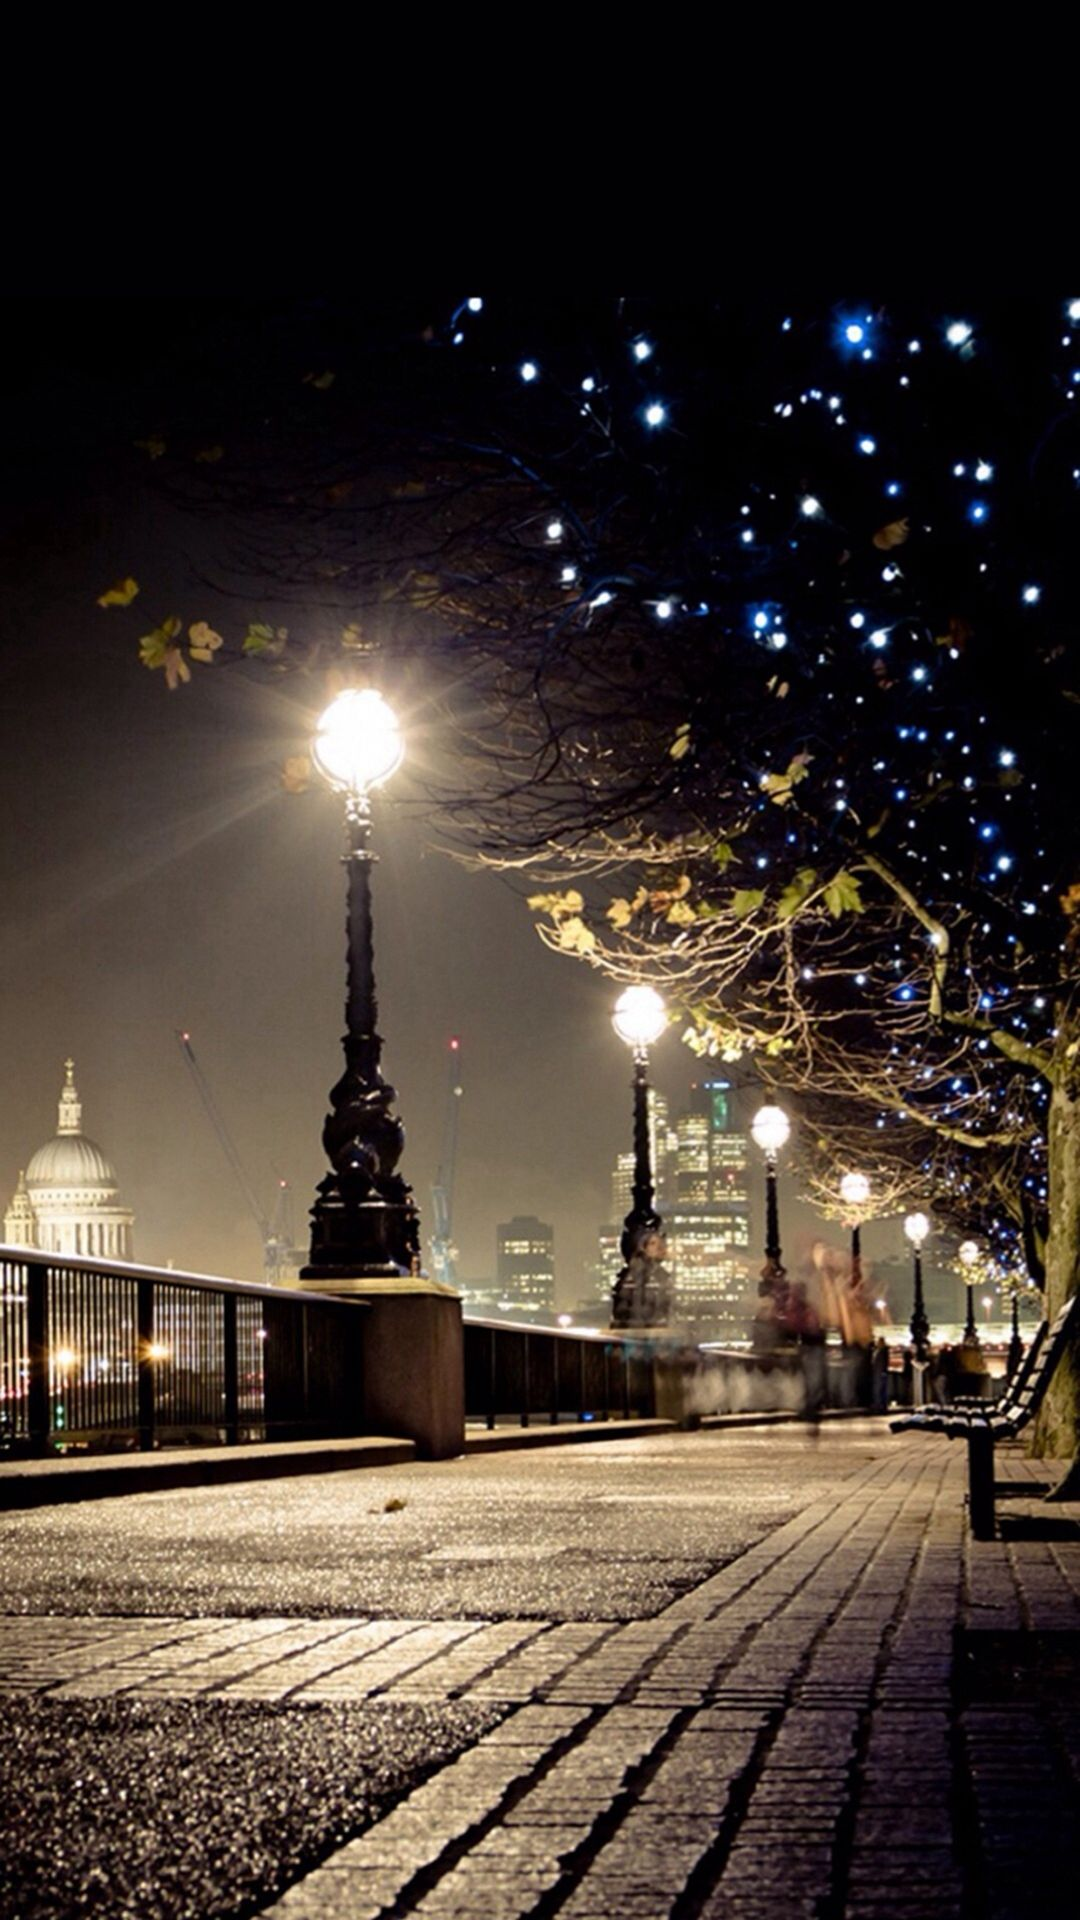 Dark Night Street Lamp Shiny Light iPhone 6 plus